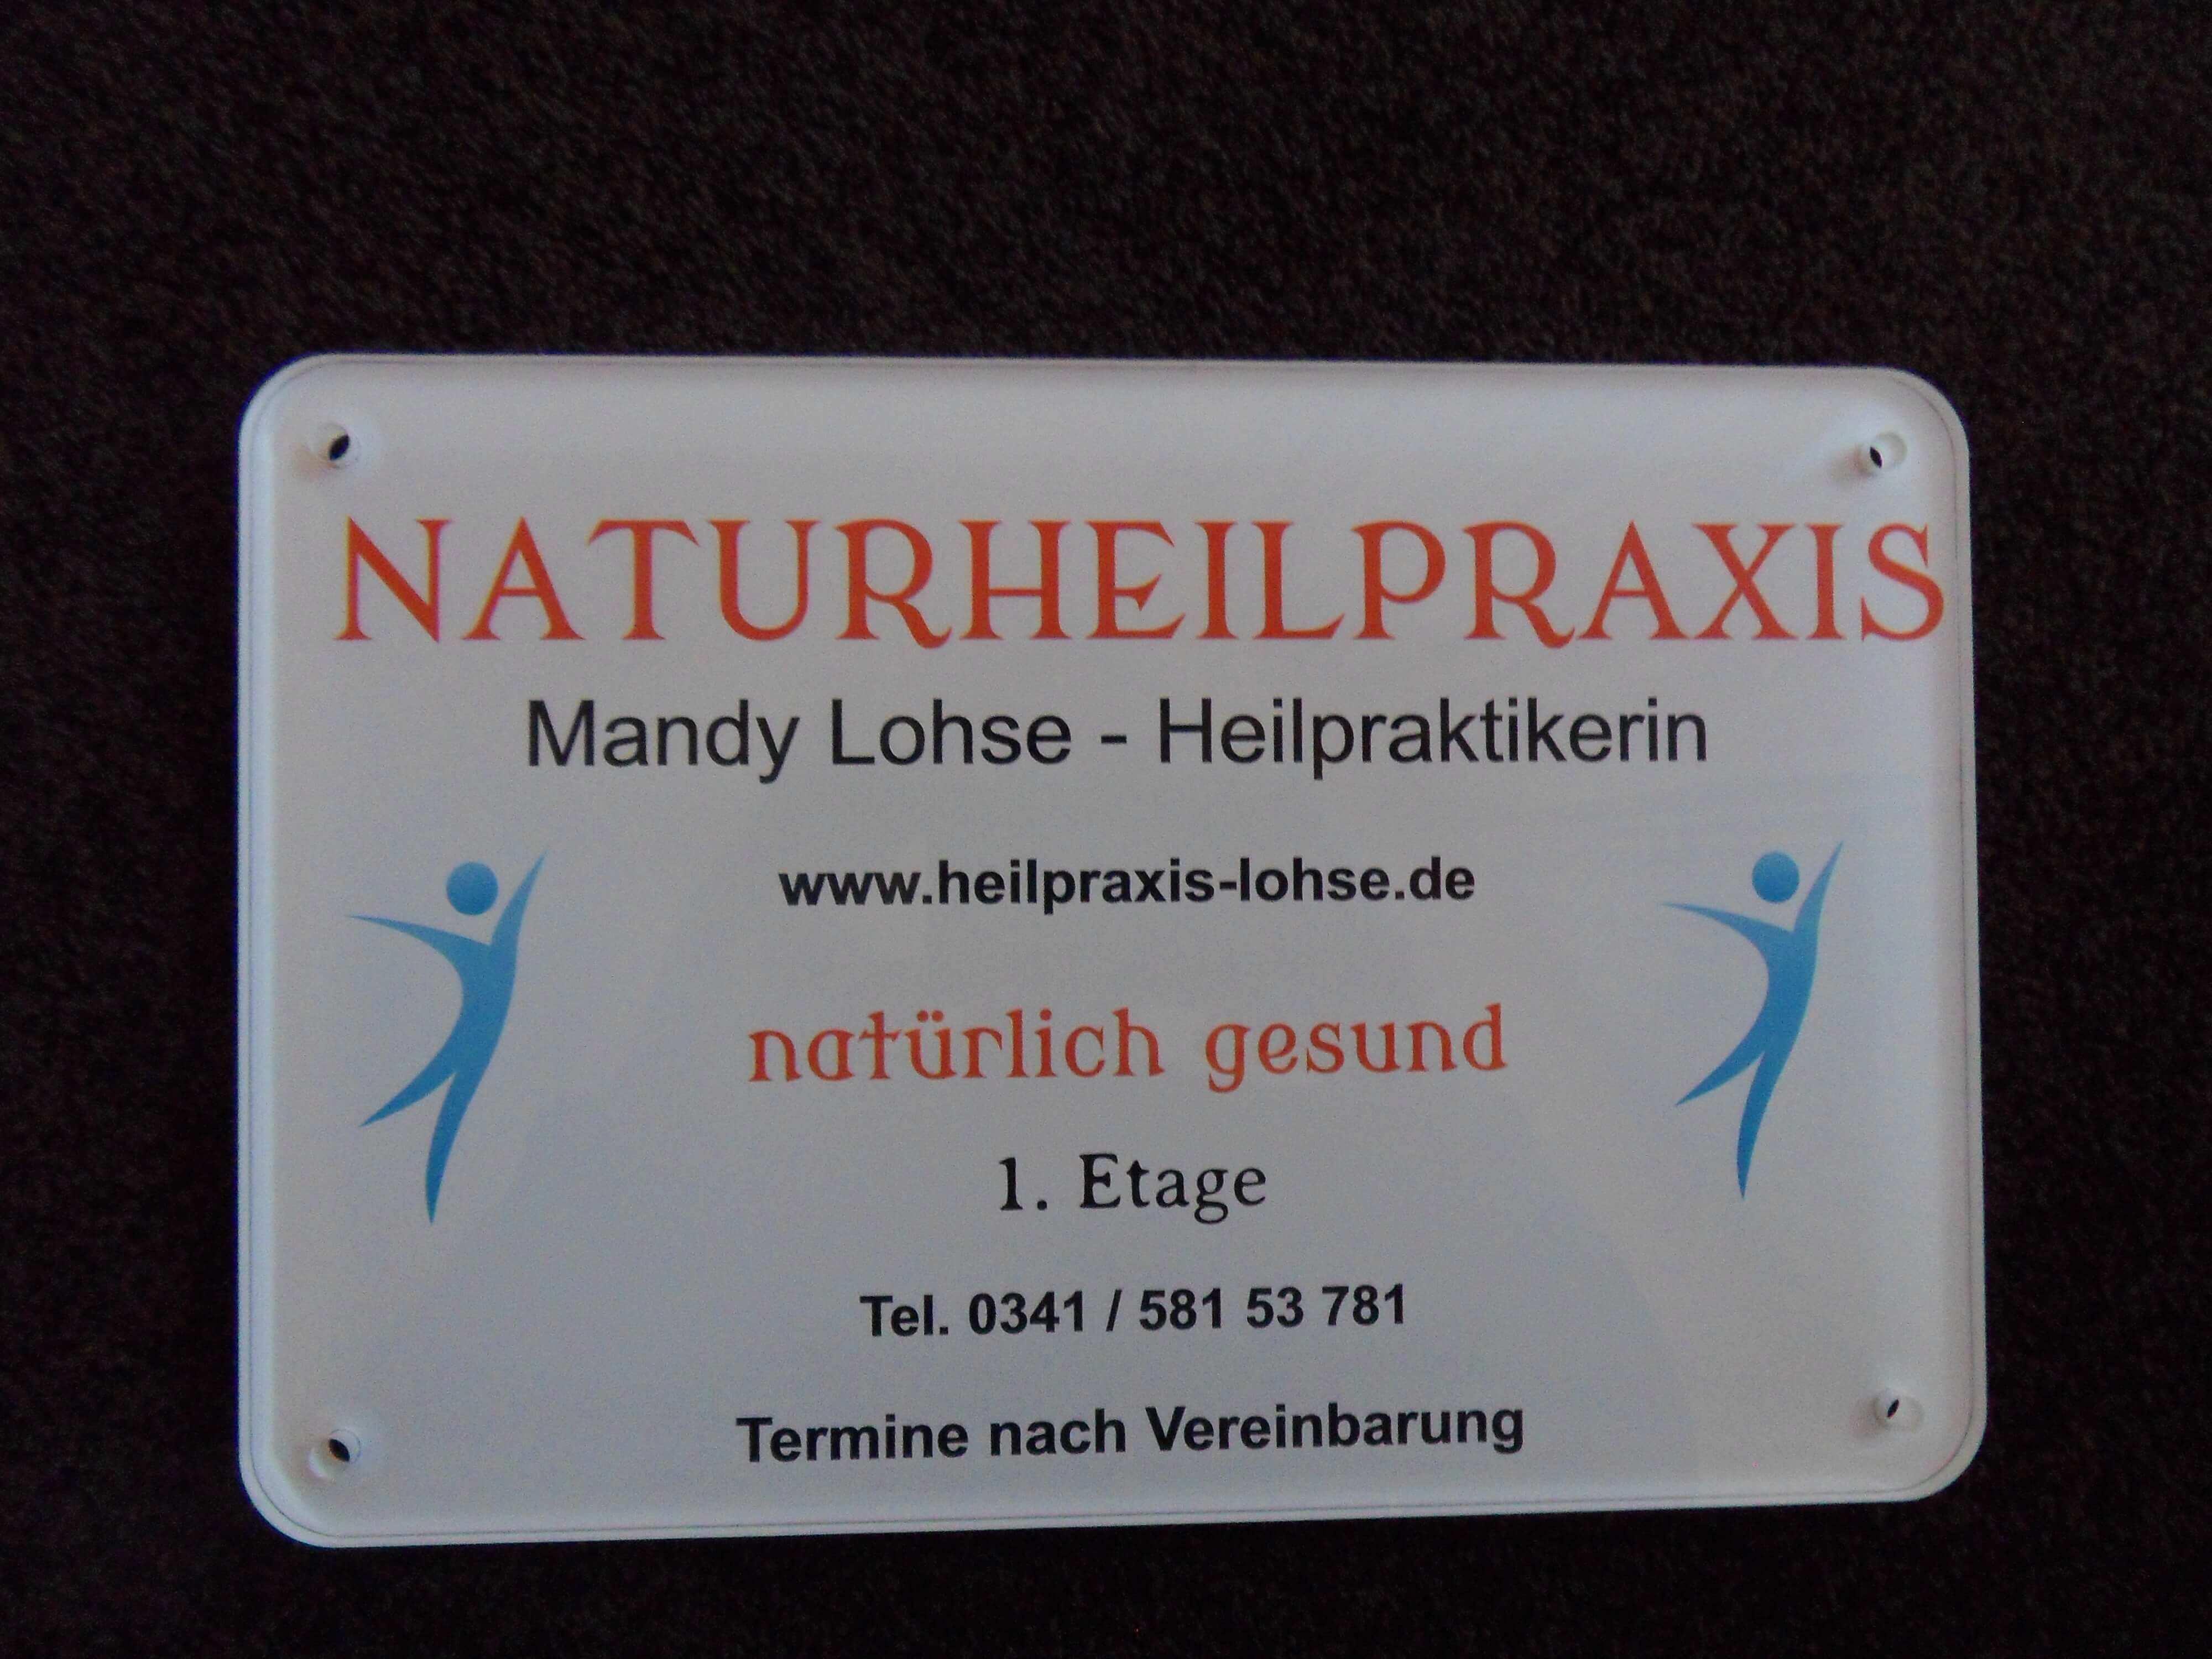 naturheilpraxis-lohse-eingangsschild